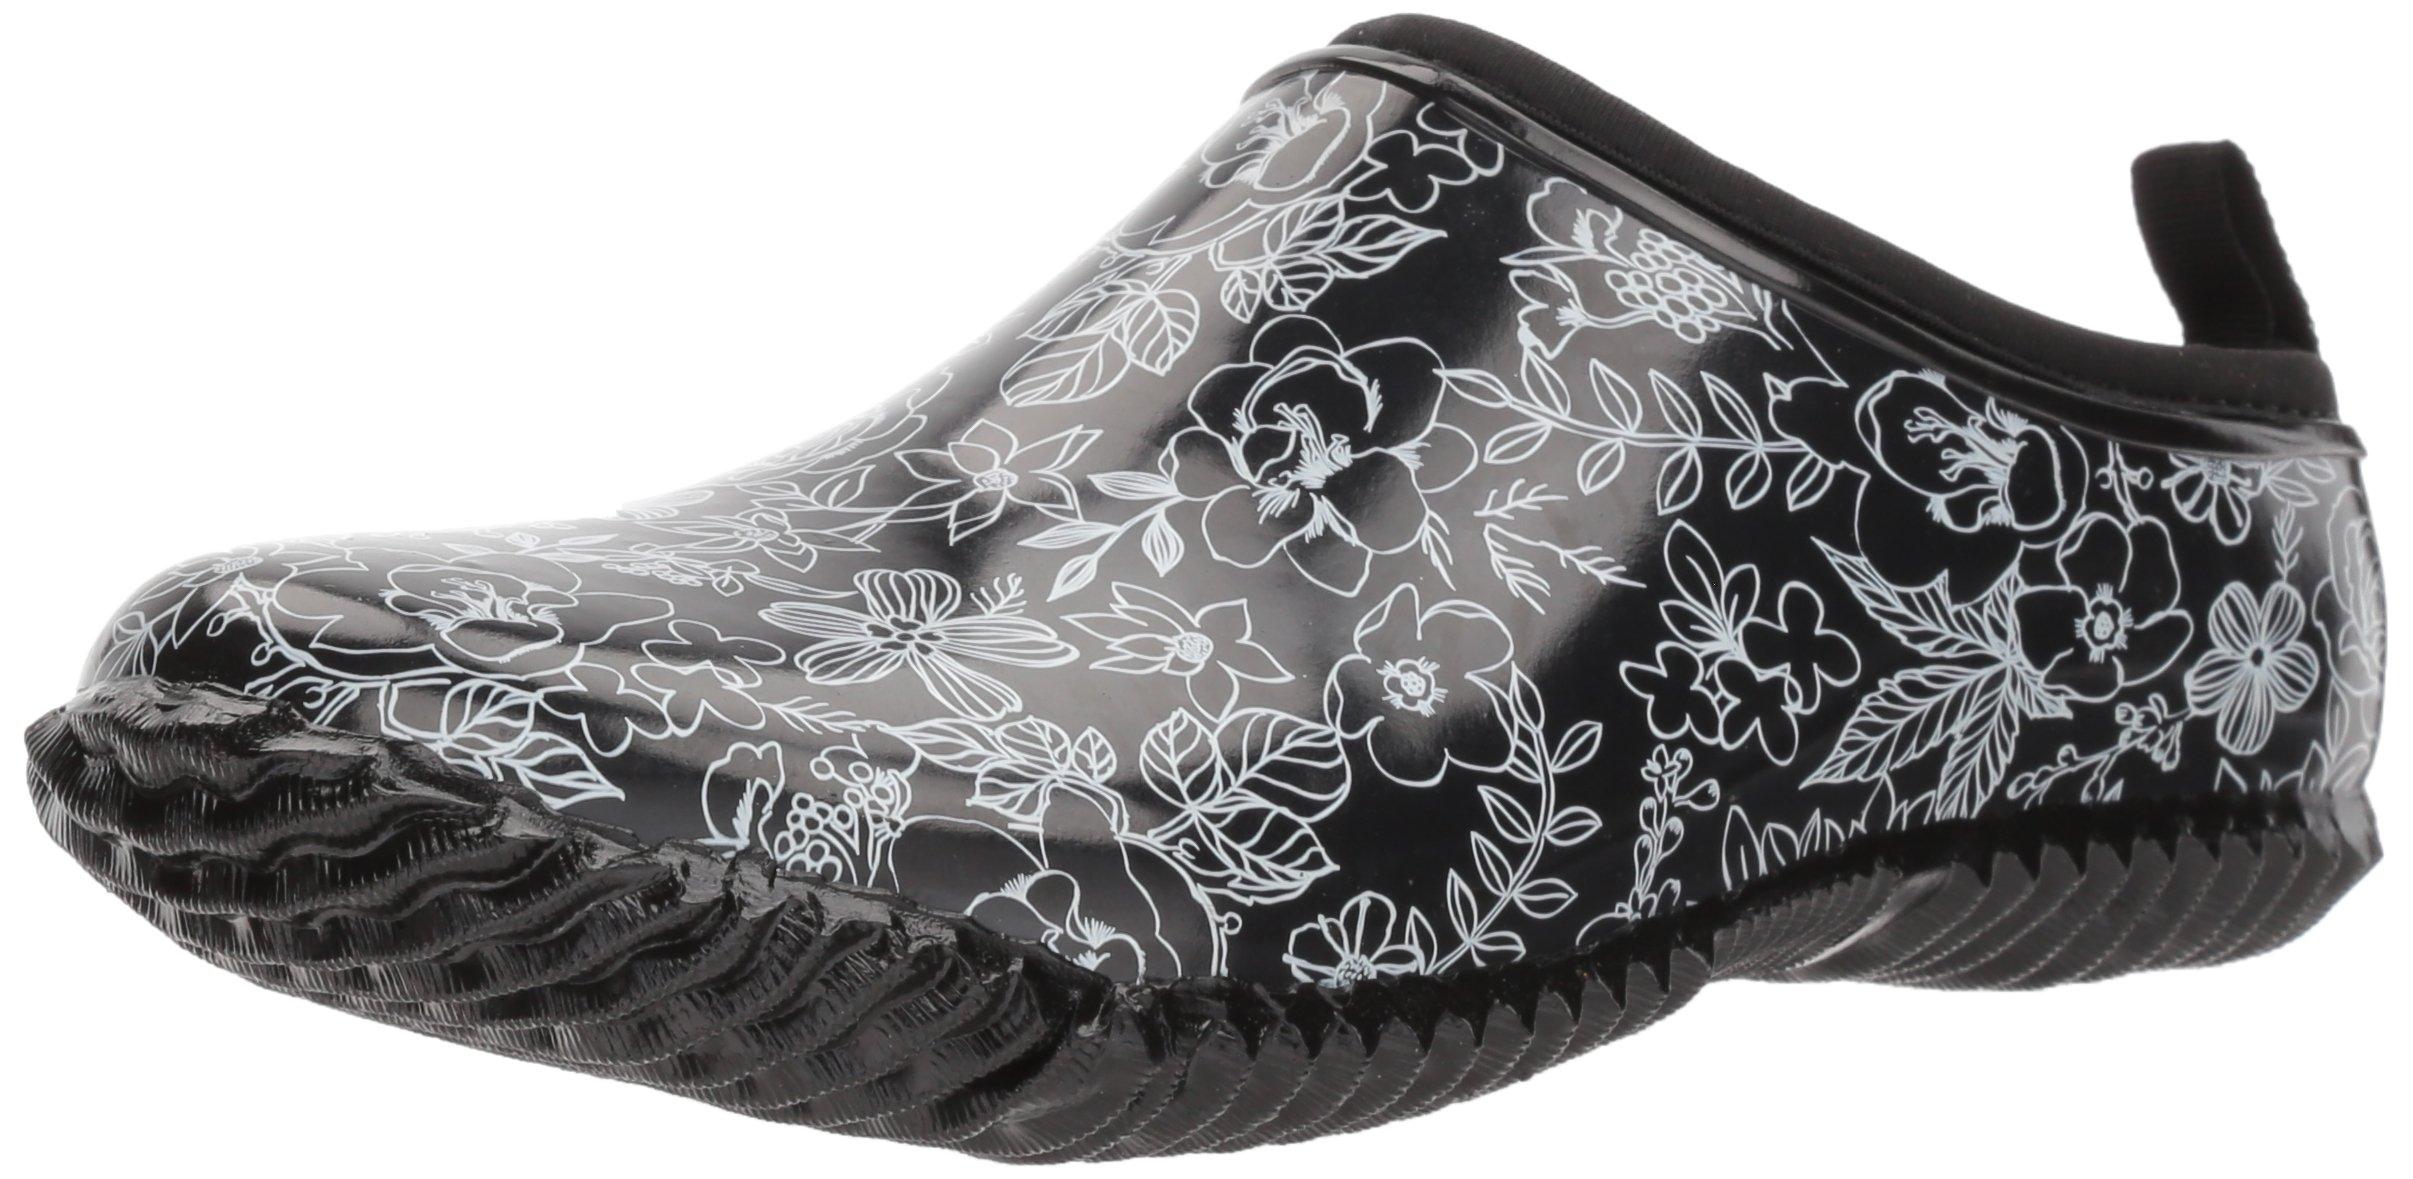 Western Chief Women's Garden Clog, Sketch Flowers, 10 M US